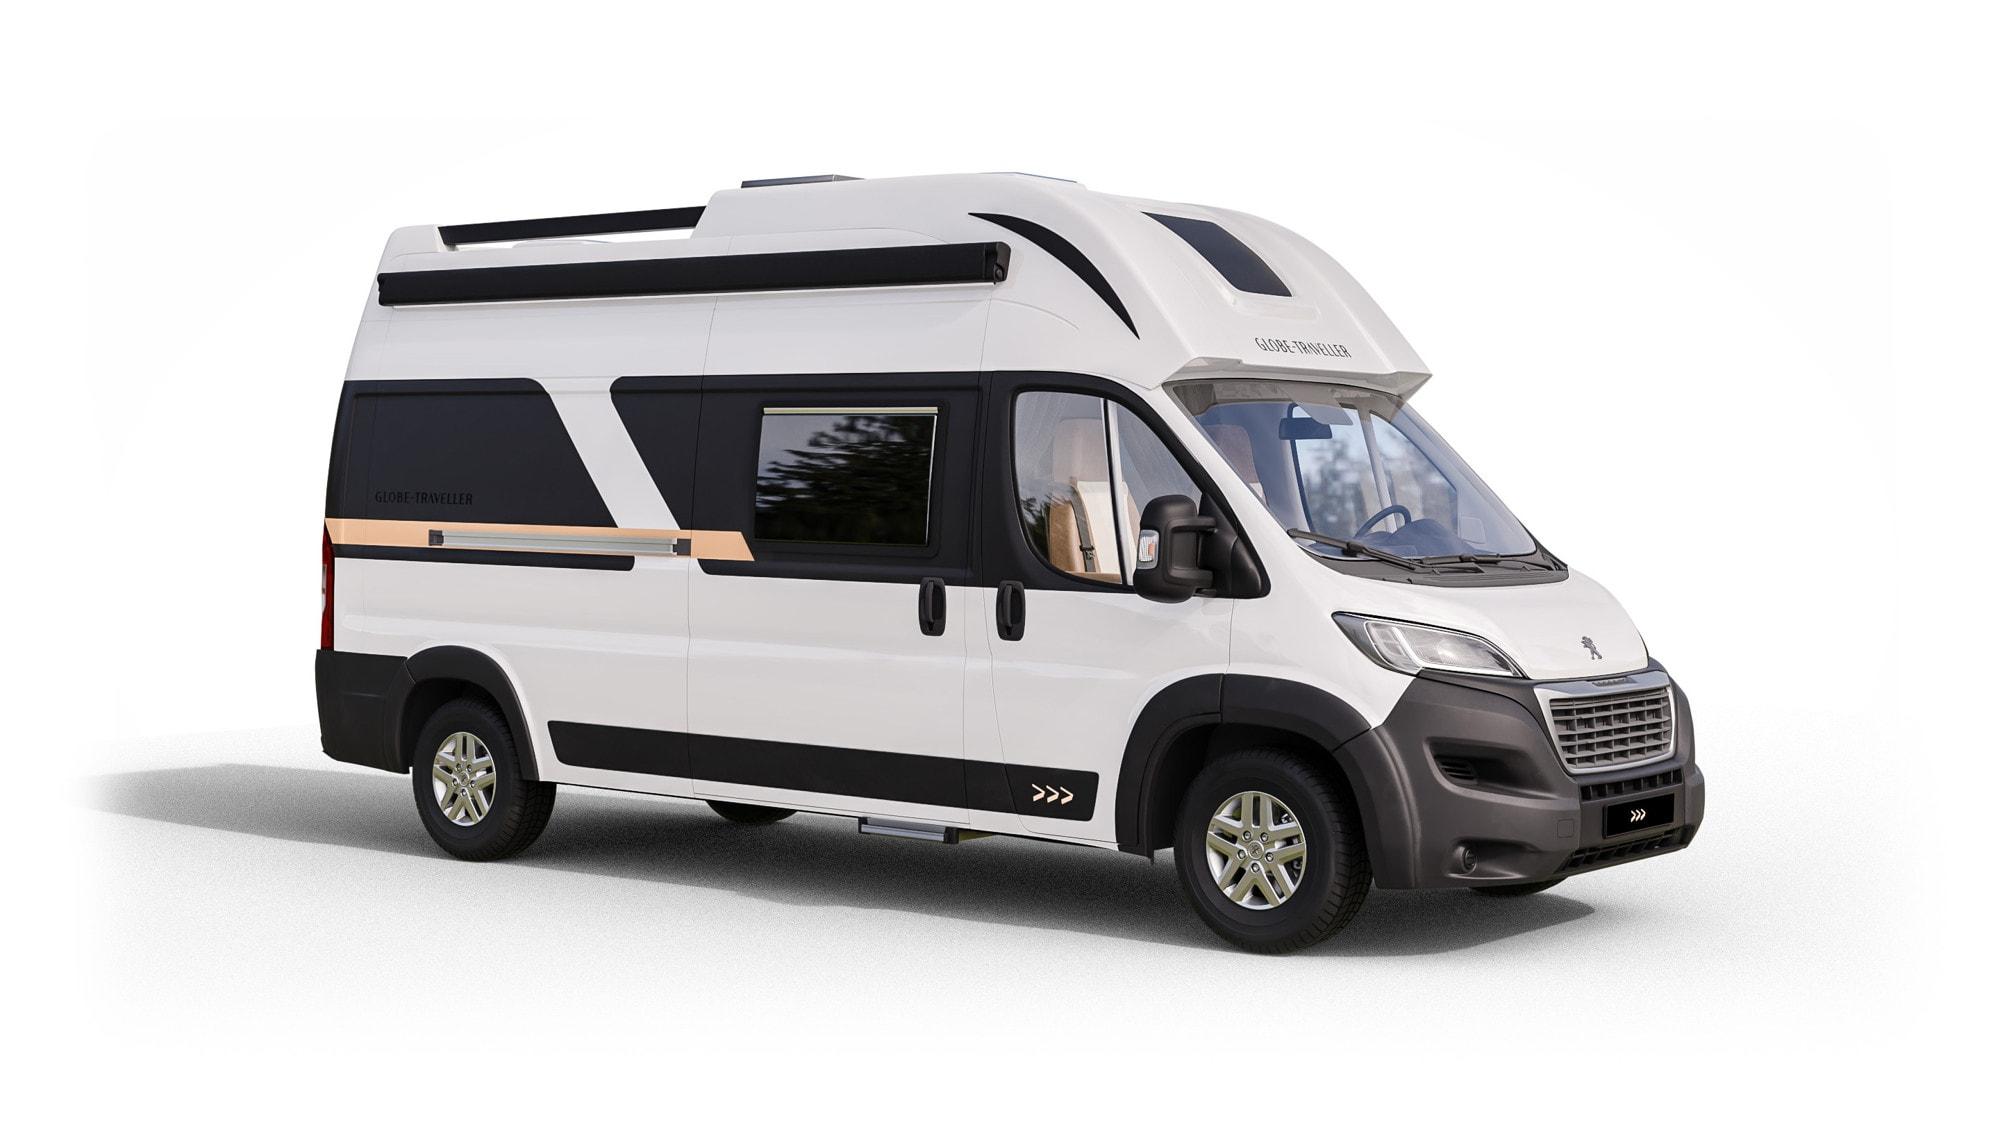 Globe-Traveller Pathfinder XS